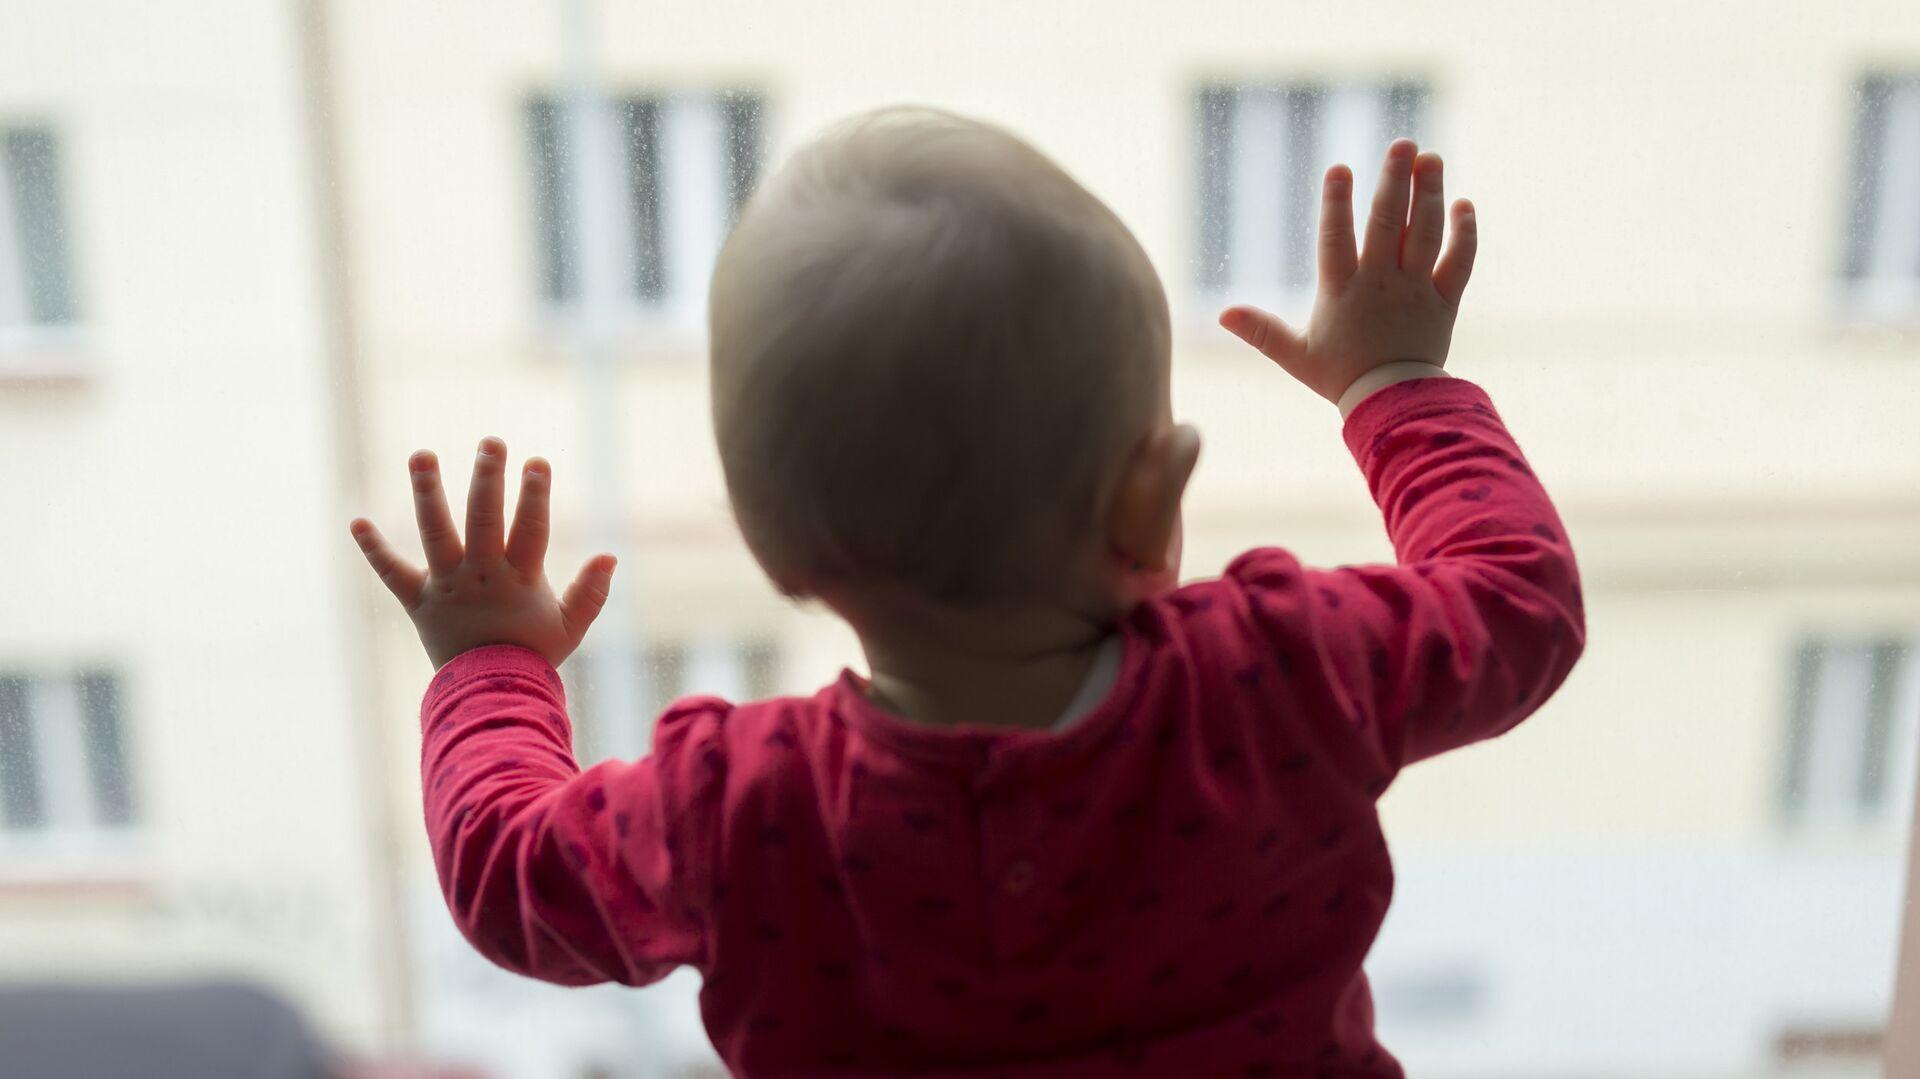 Ребенок у окна - РИА Новости, 1920, 25.05.2021